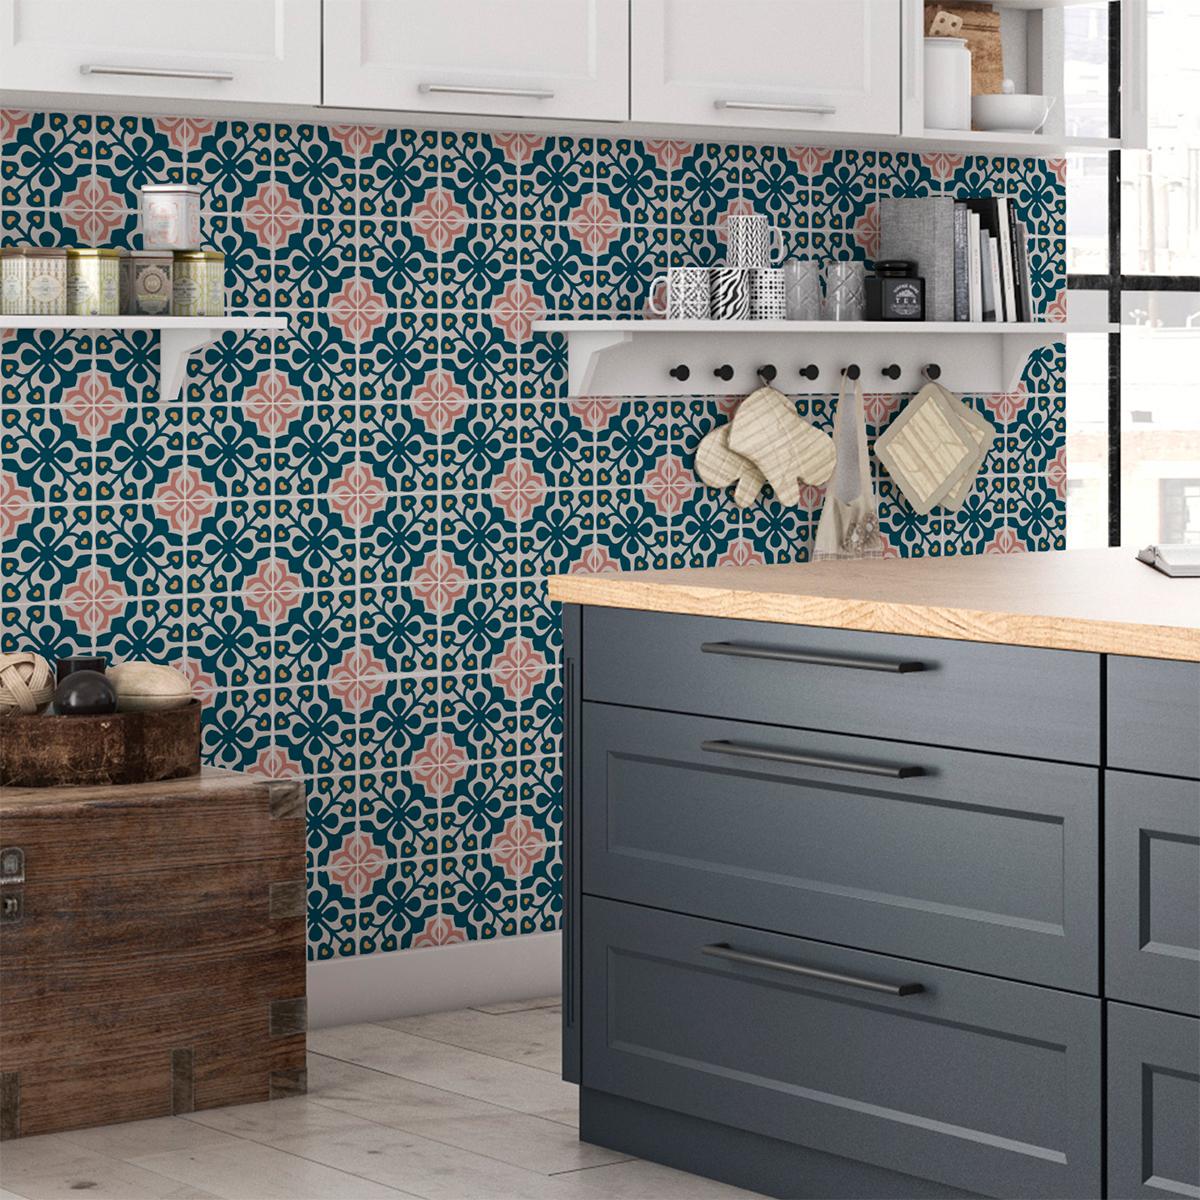 60 stickers carreaux de ciment azulejos apollo cuisine. Black Bedroom Furniture Sets. Home Design Ideas